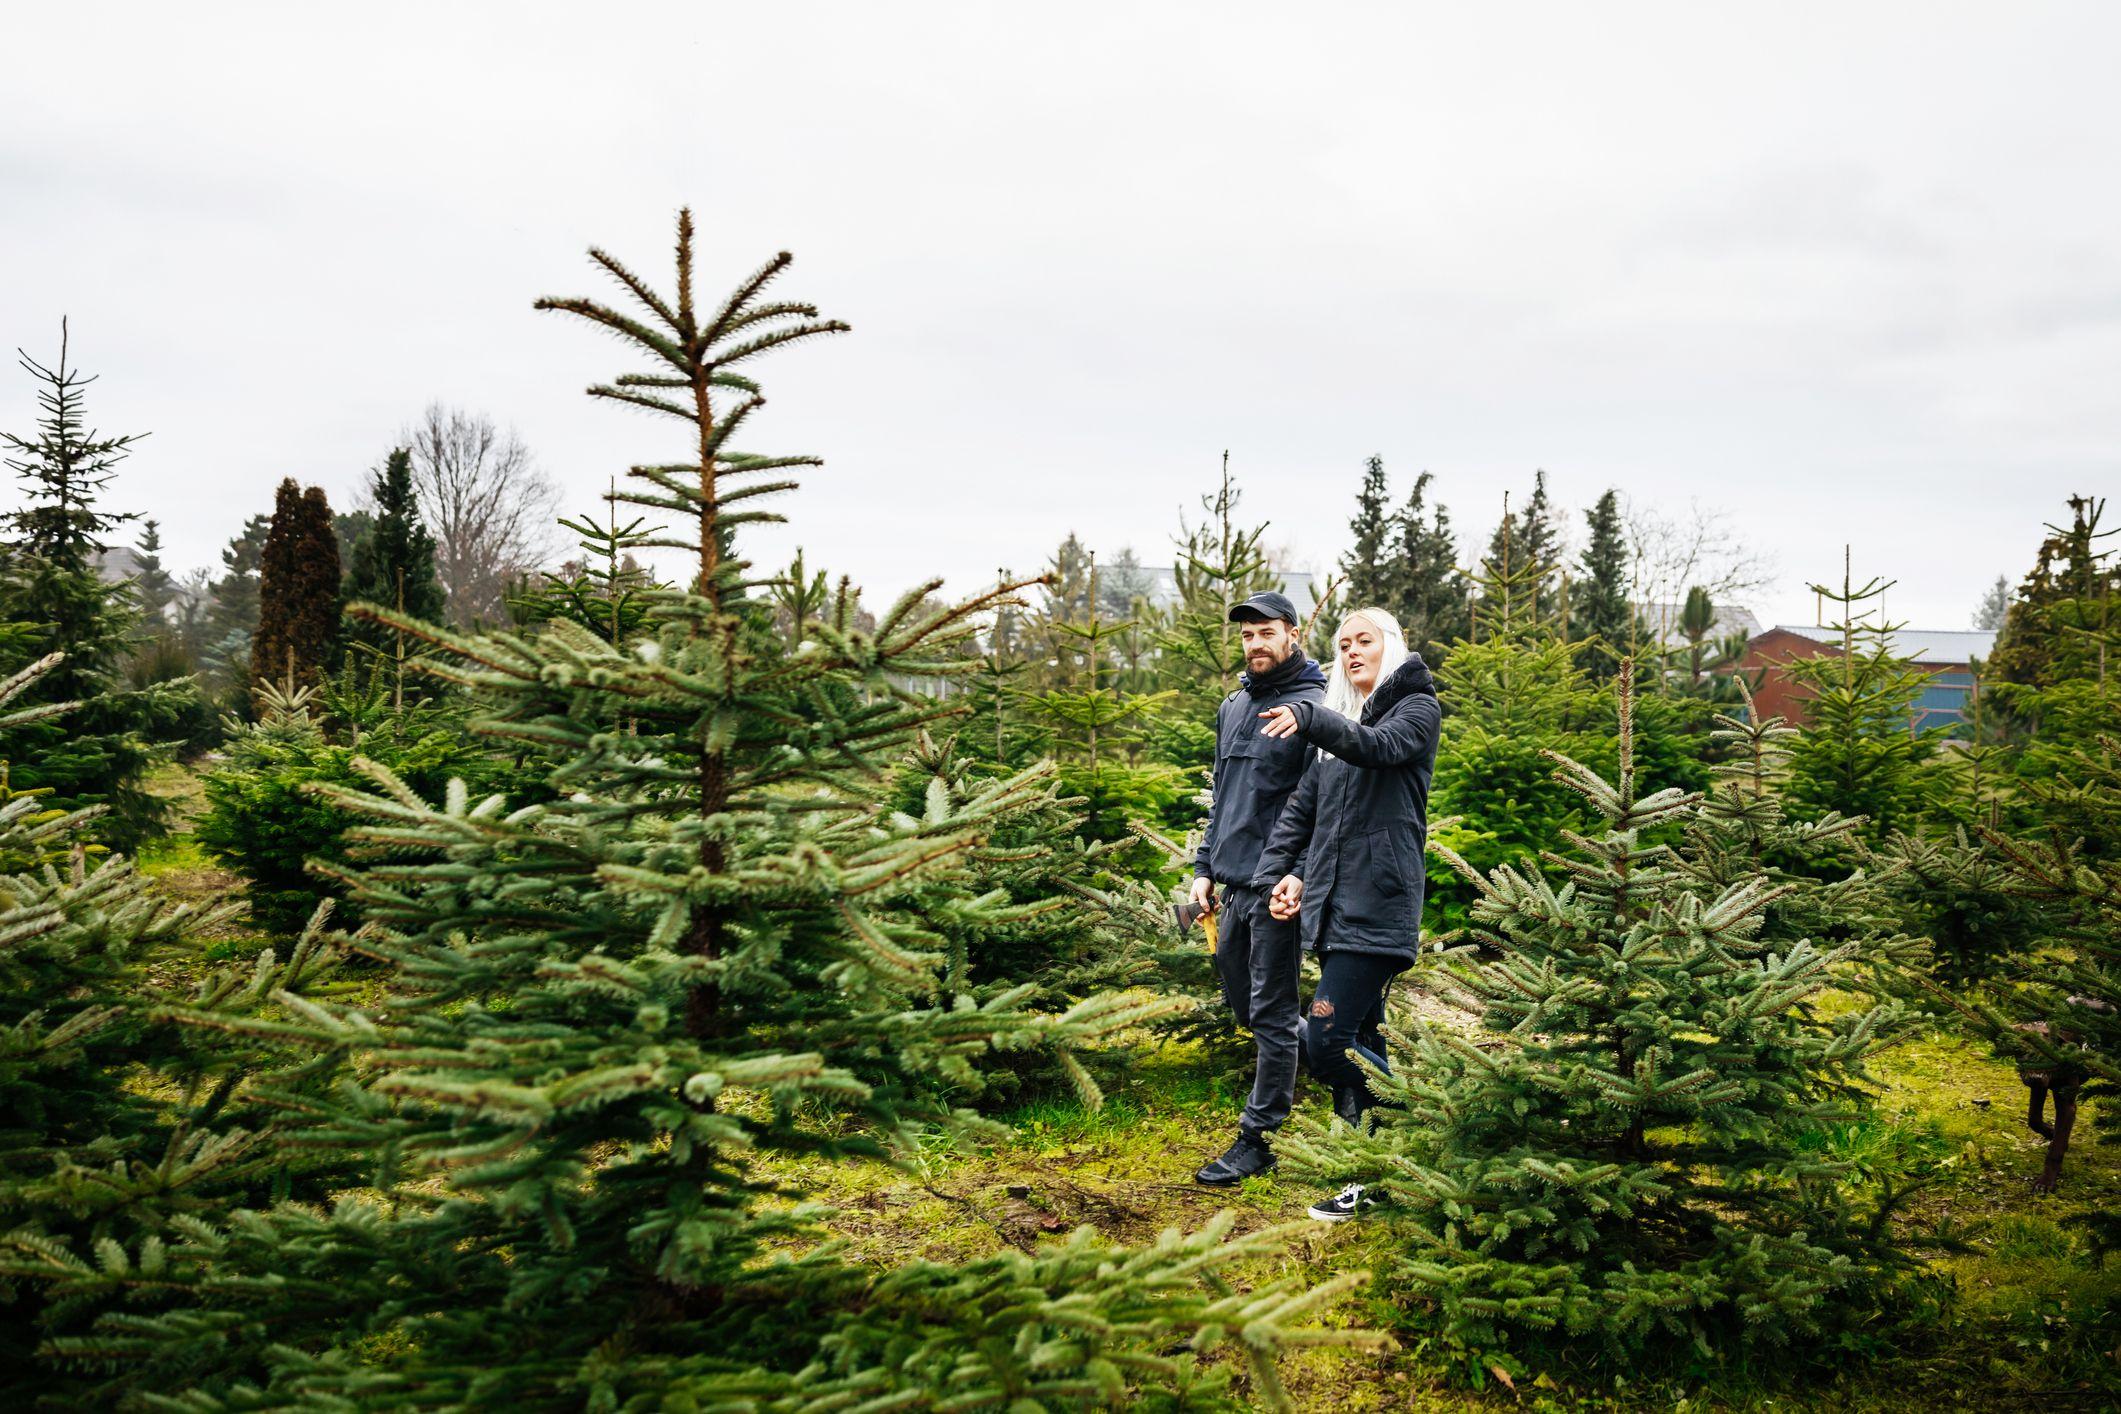 Real Christmas Trees: Buying, Choosing, Preparing and Caring